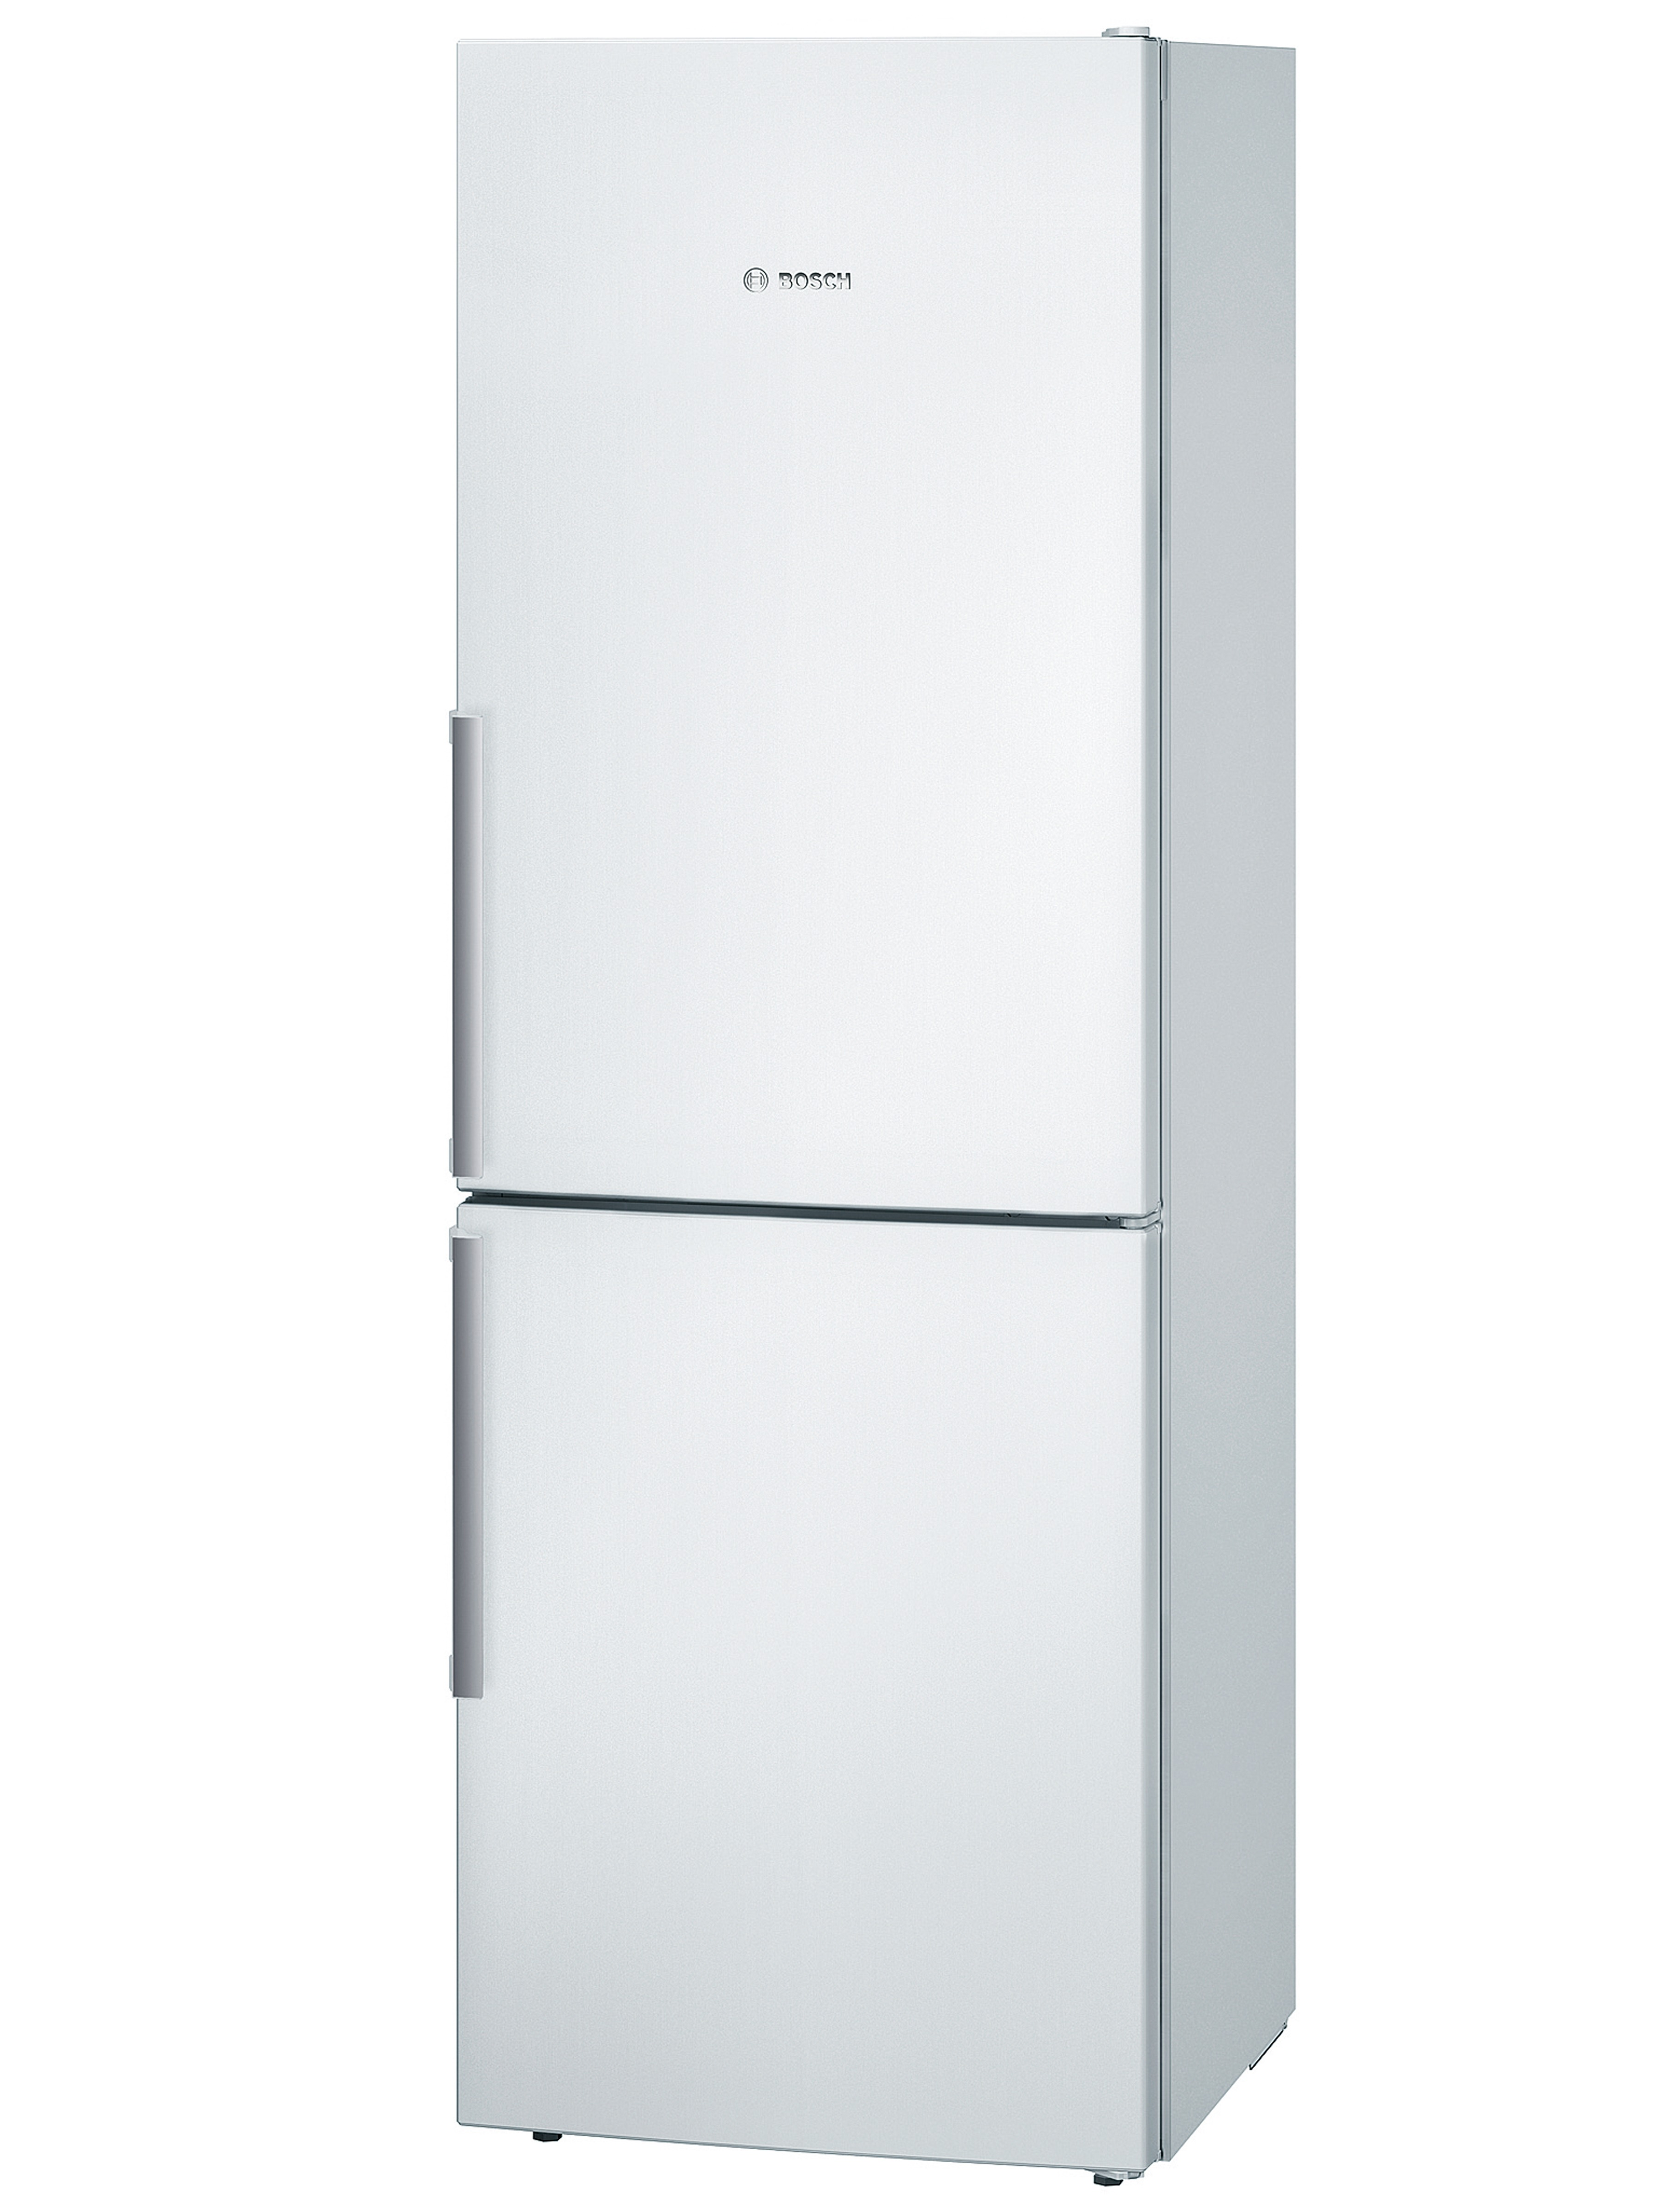 Bosch koelkast met vriesvak KGV33GW31